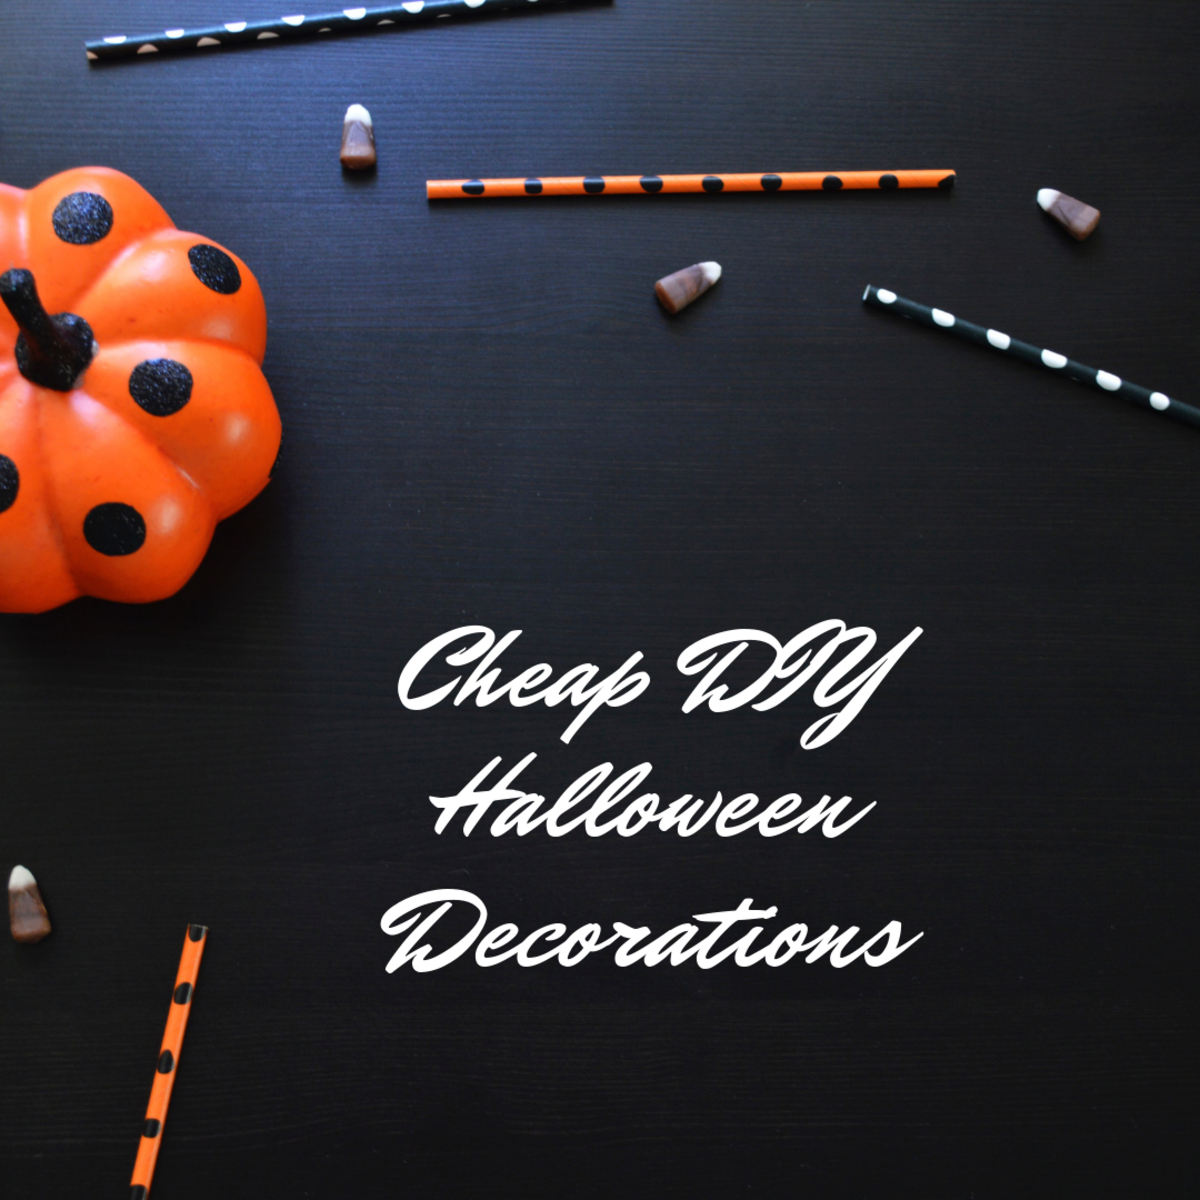 9 Cheap DIY Halloween Decorations